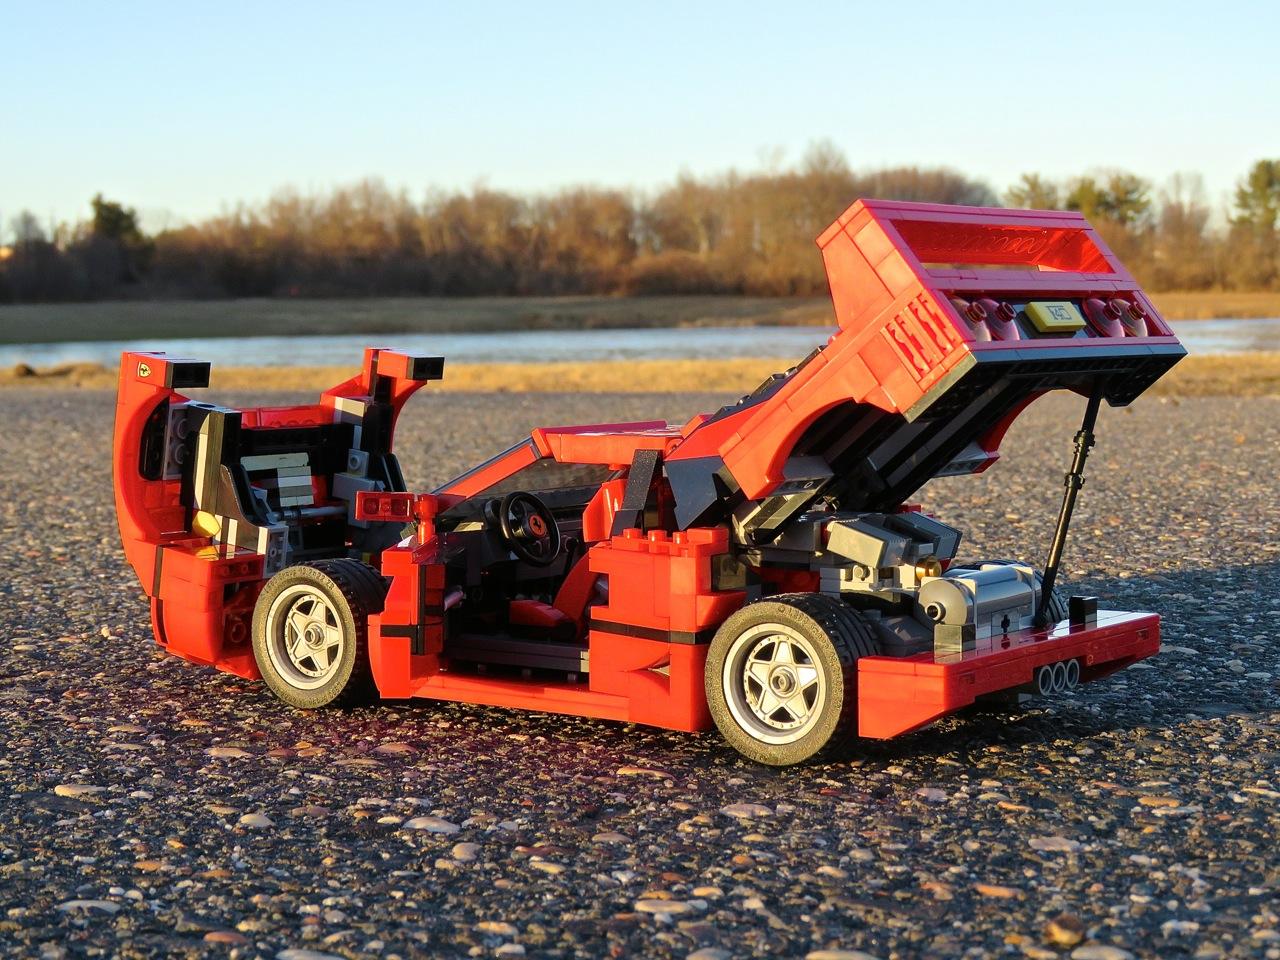 Lego Ferrari F40 12